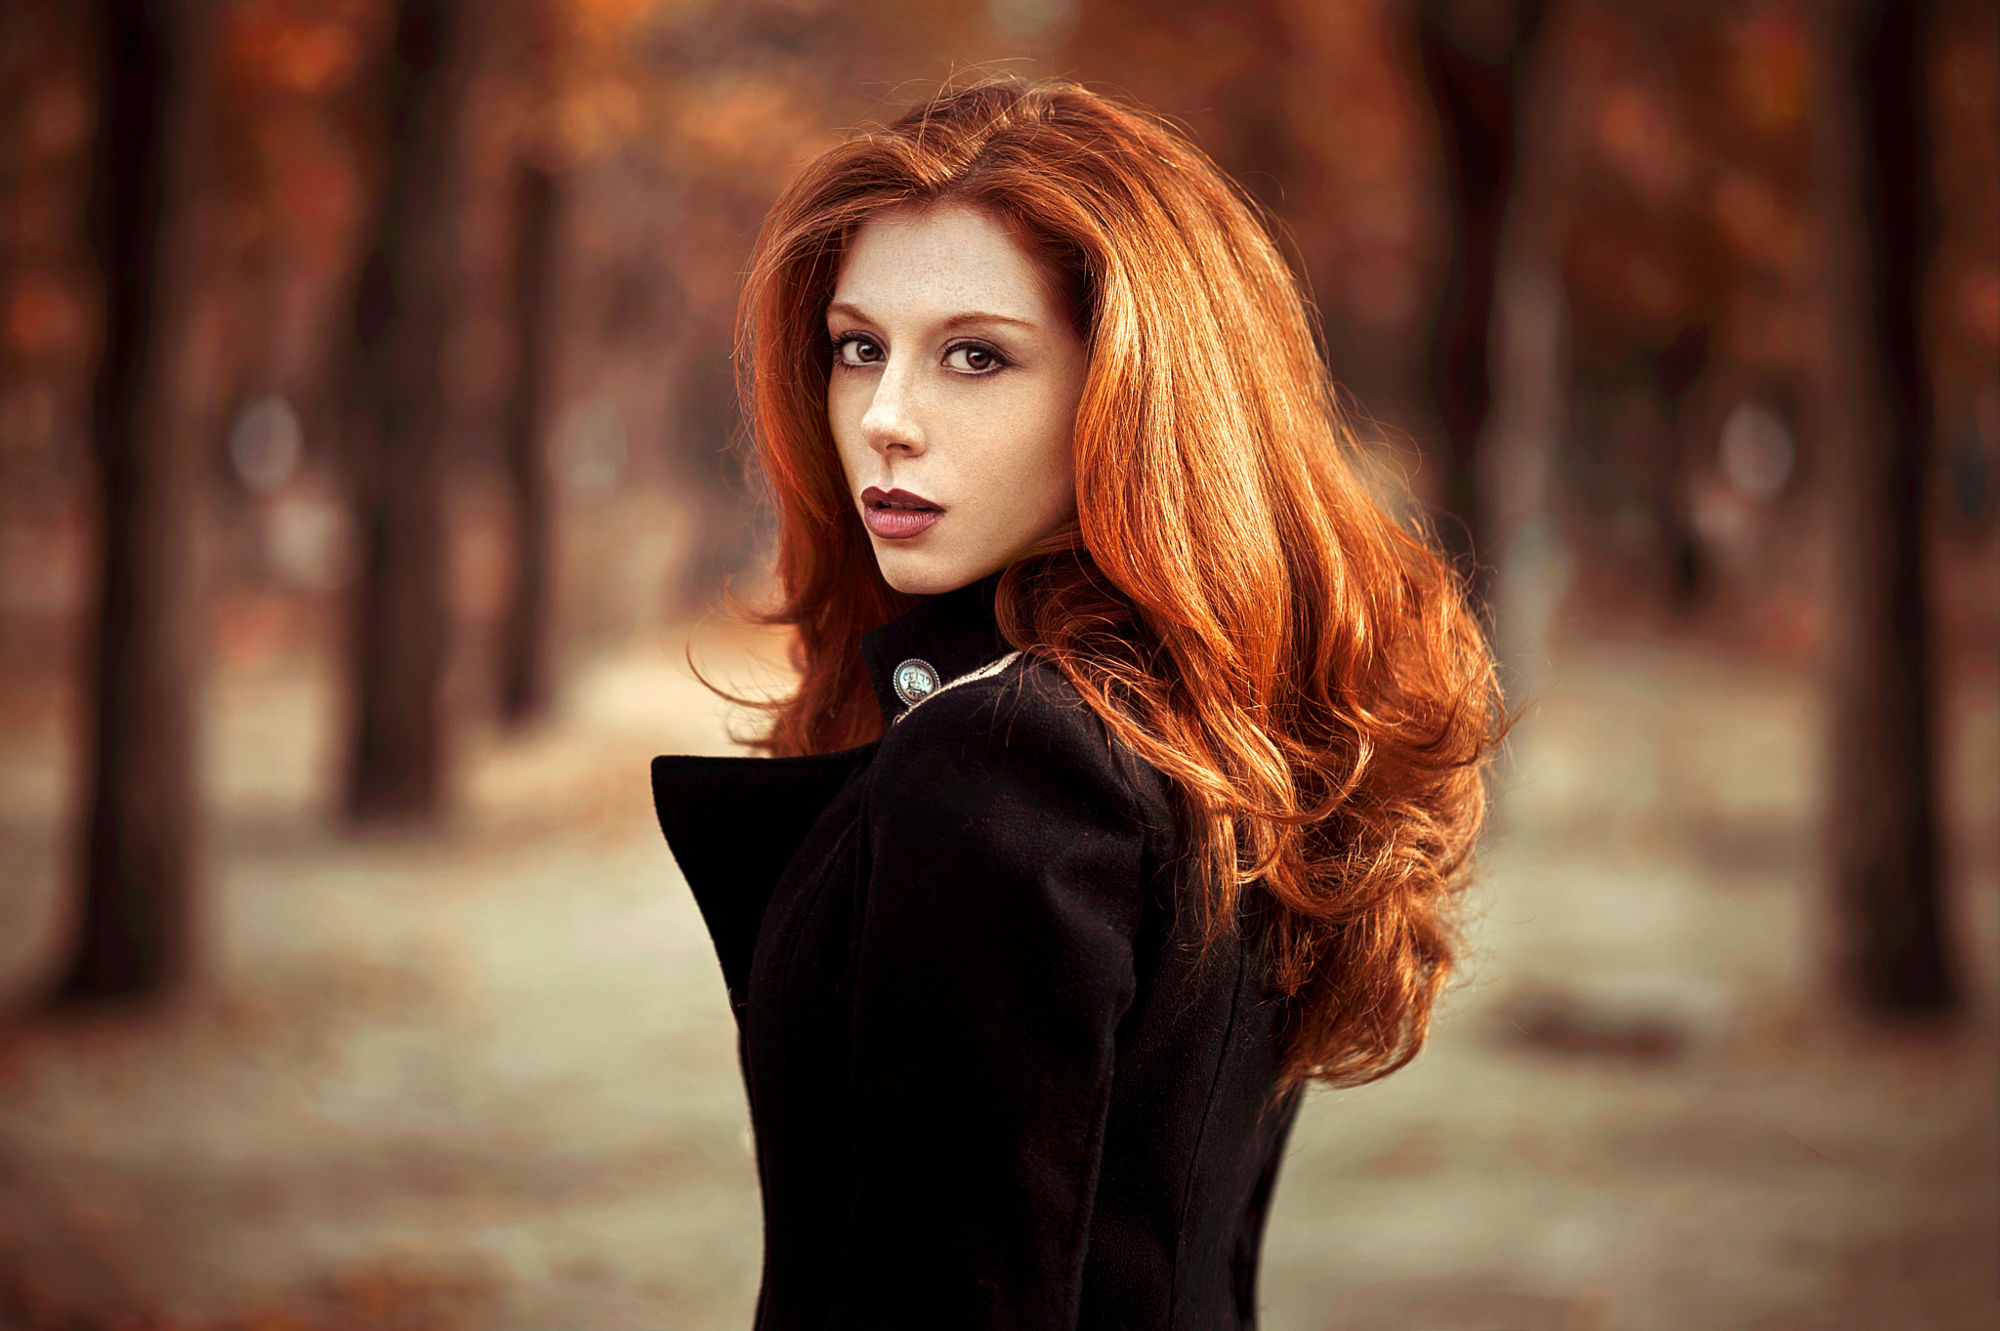 Рыженькая девушка картинка